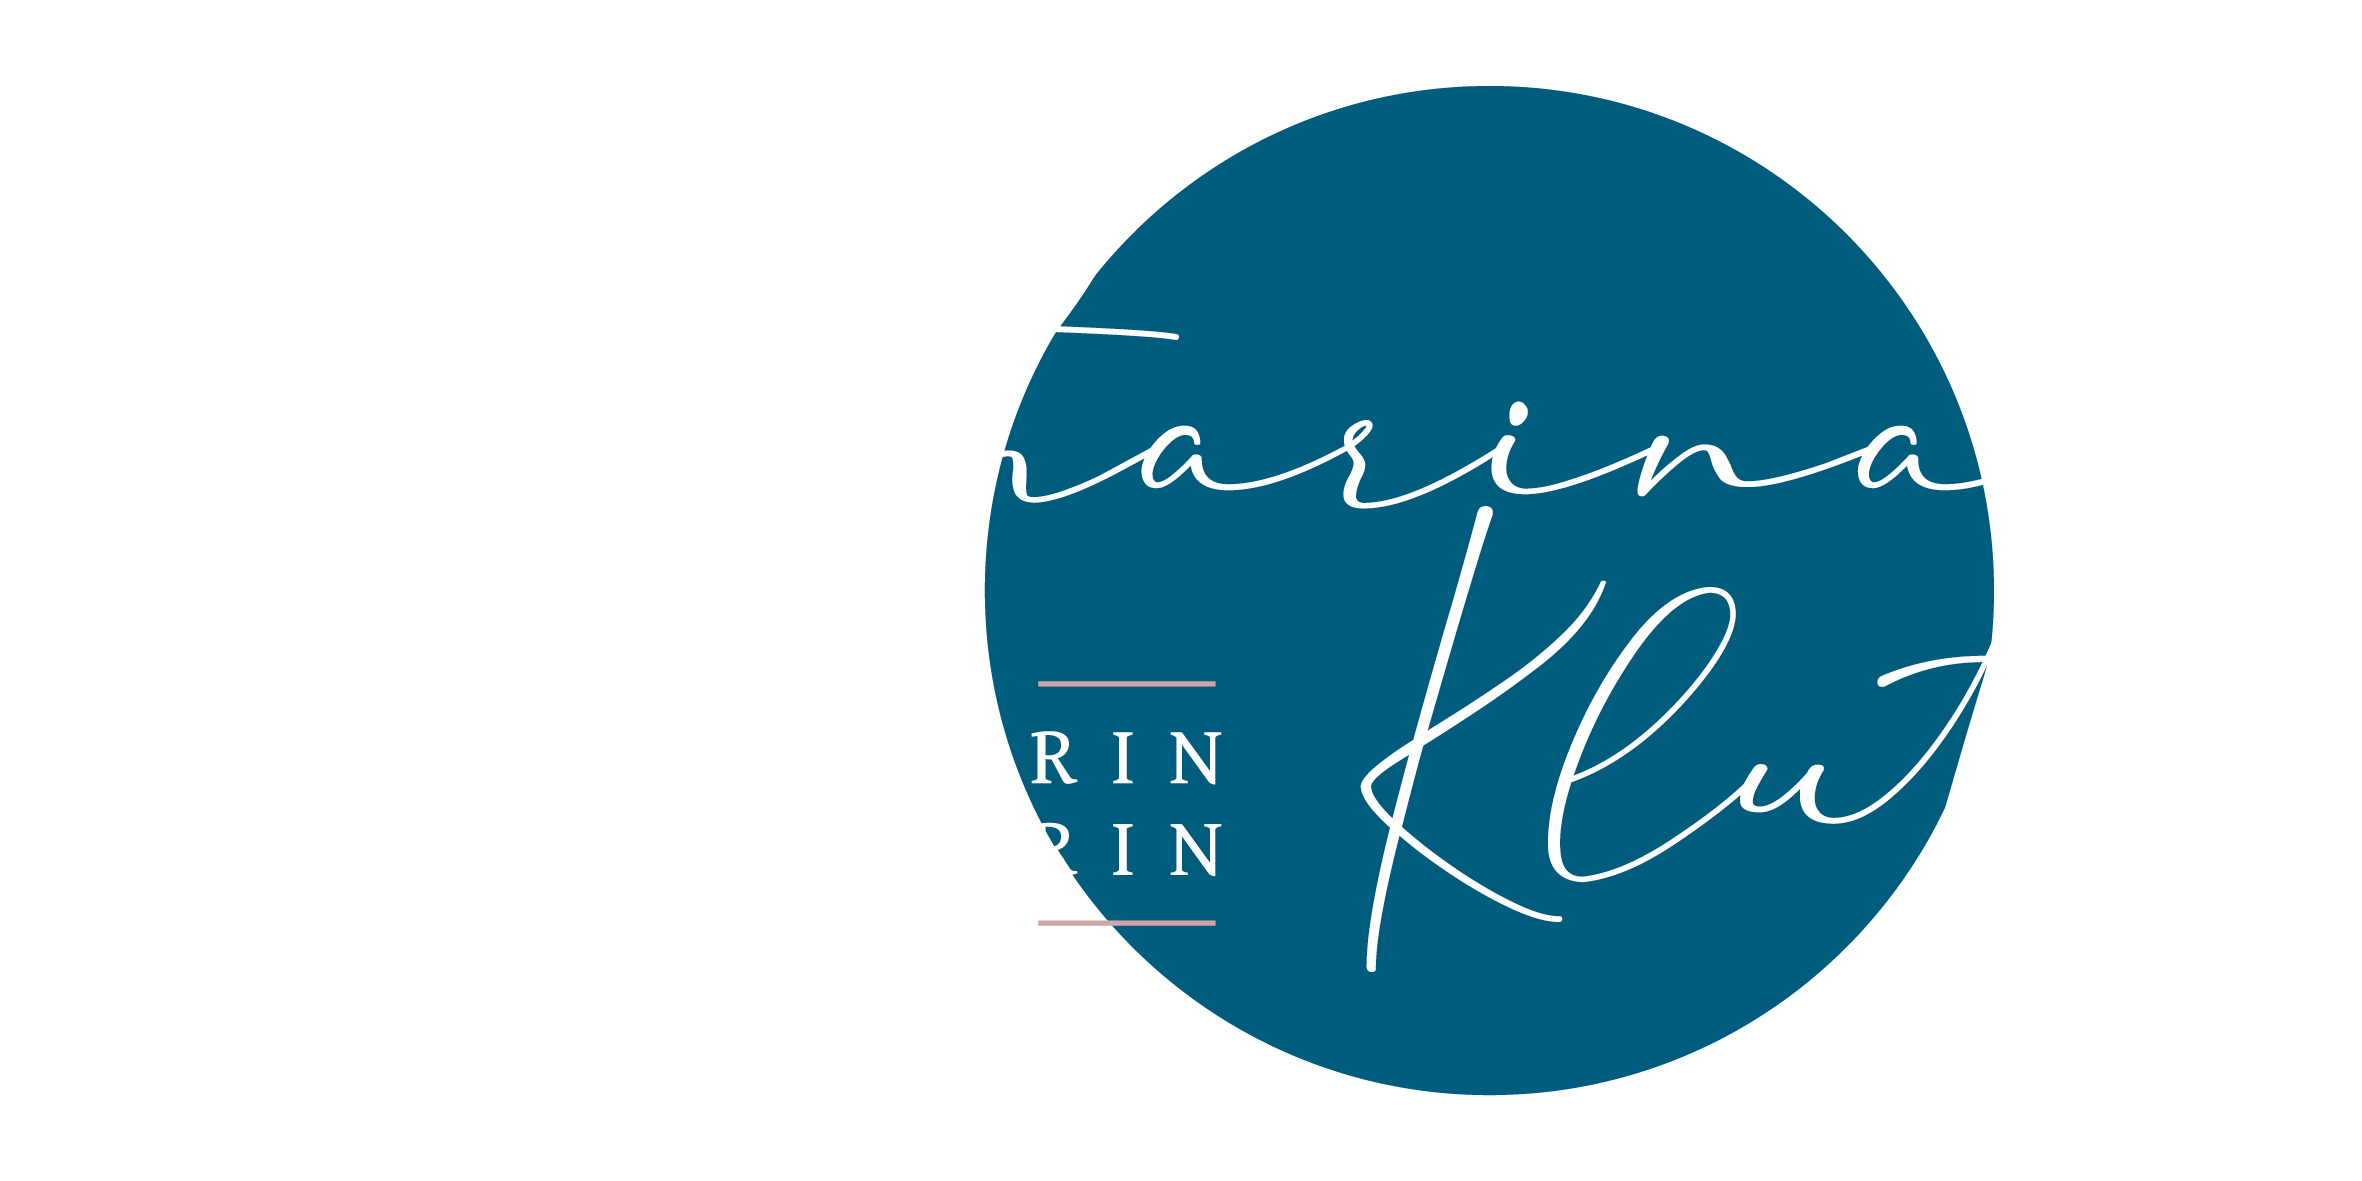 Katharina Klutz